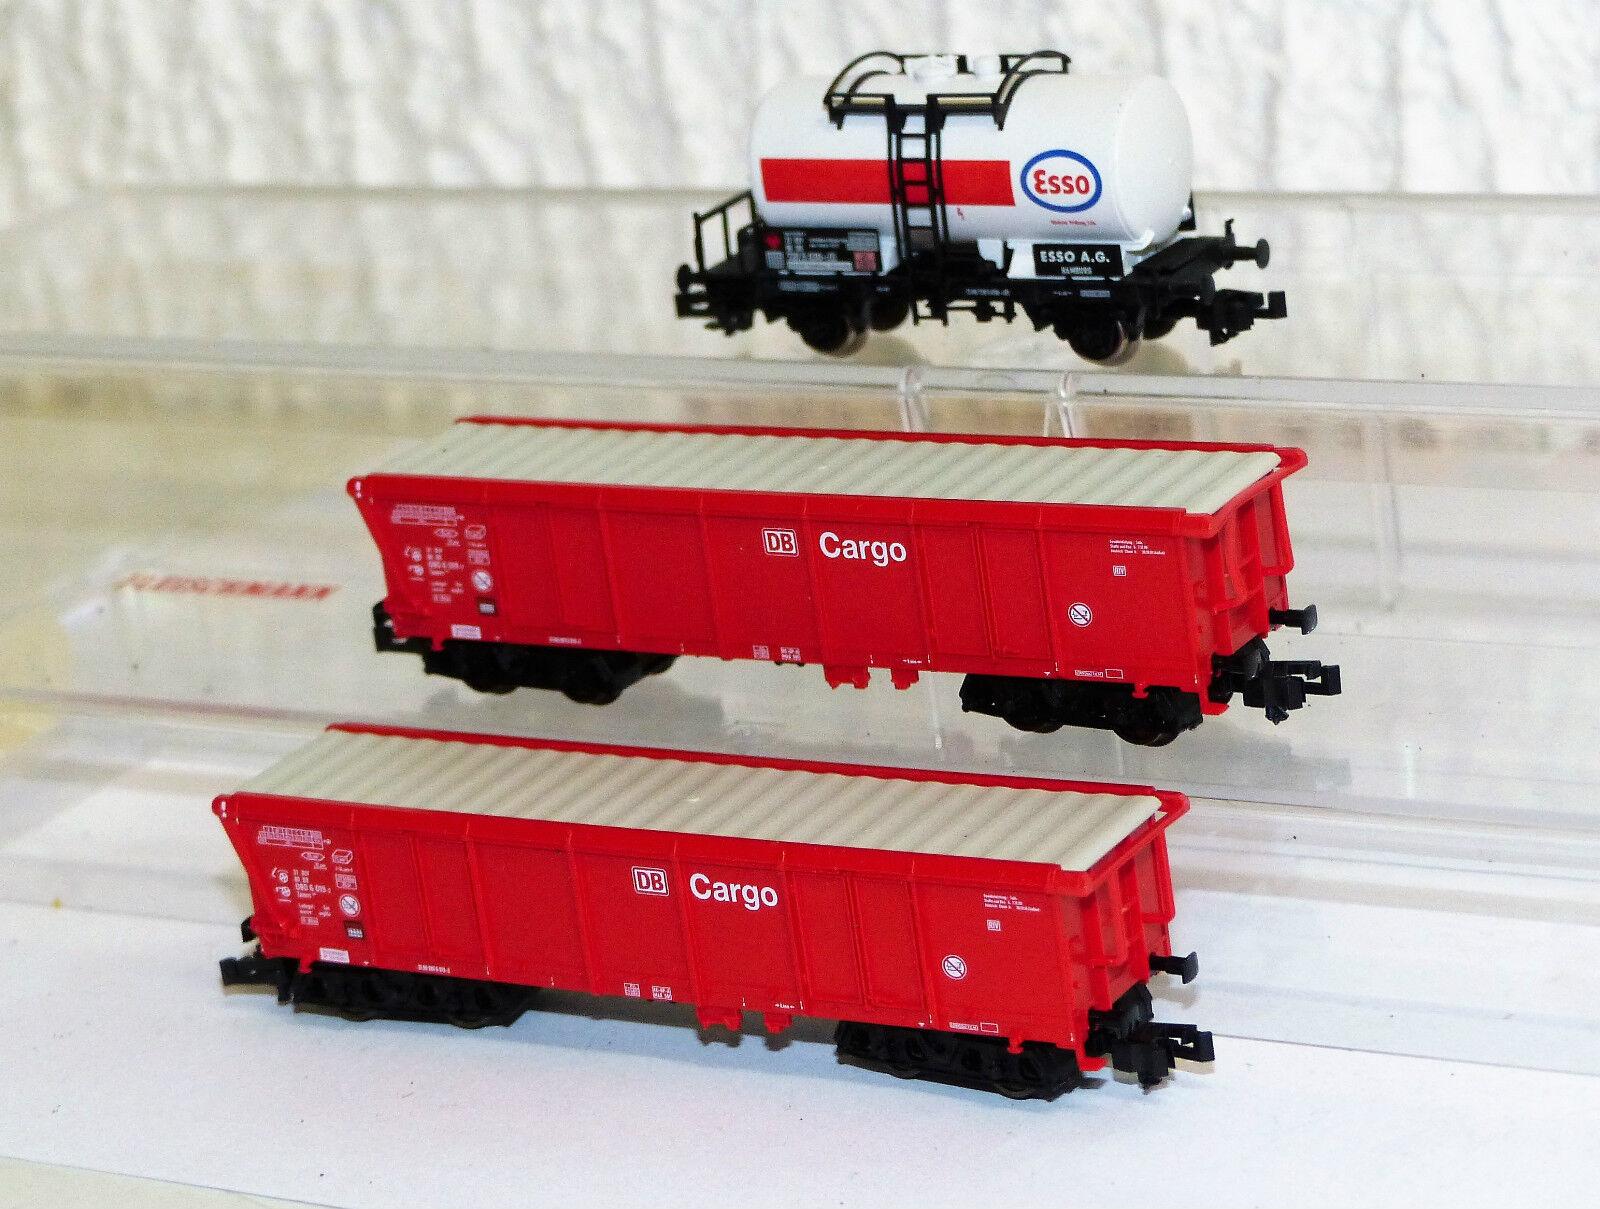 3x Fleischmann piccolo carri merci: 8410 K esso, 2x 8293 K Roll TETTO AUTO TOP N